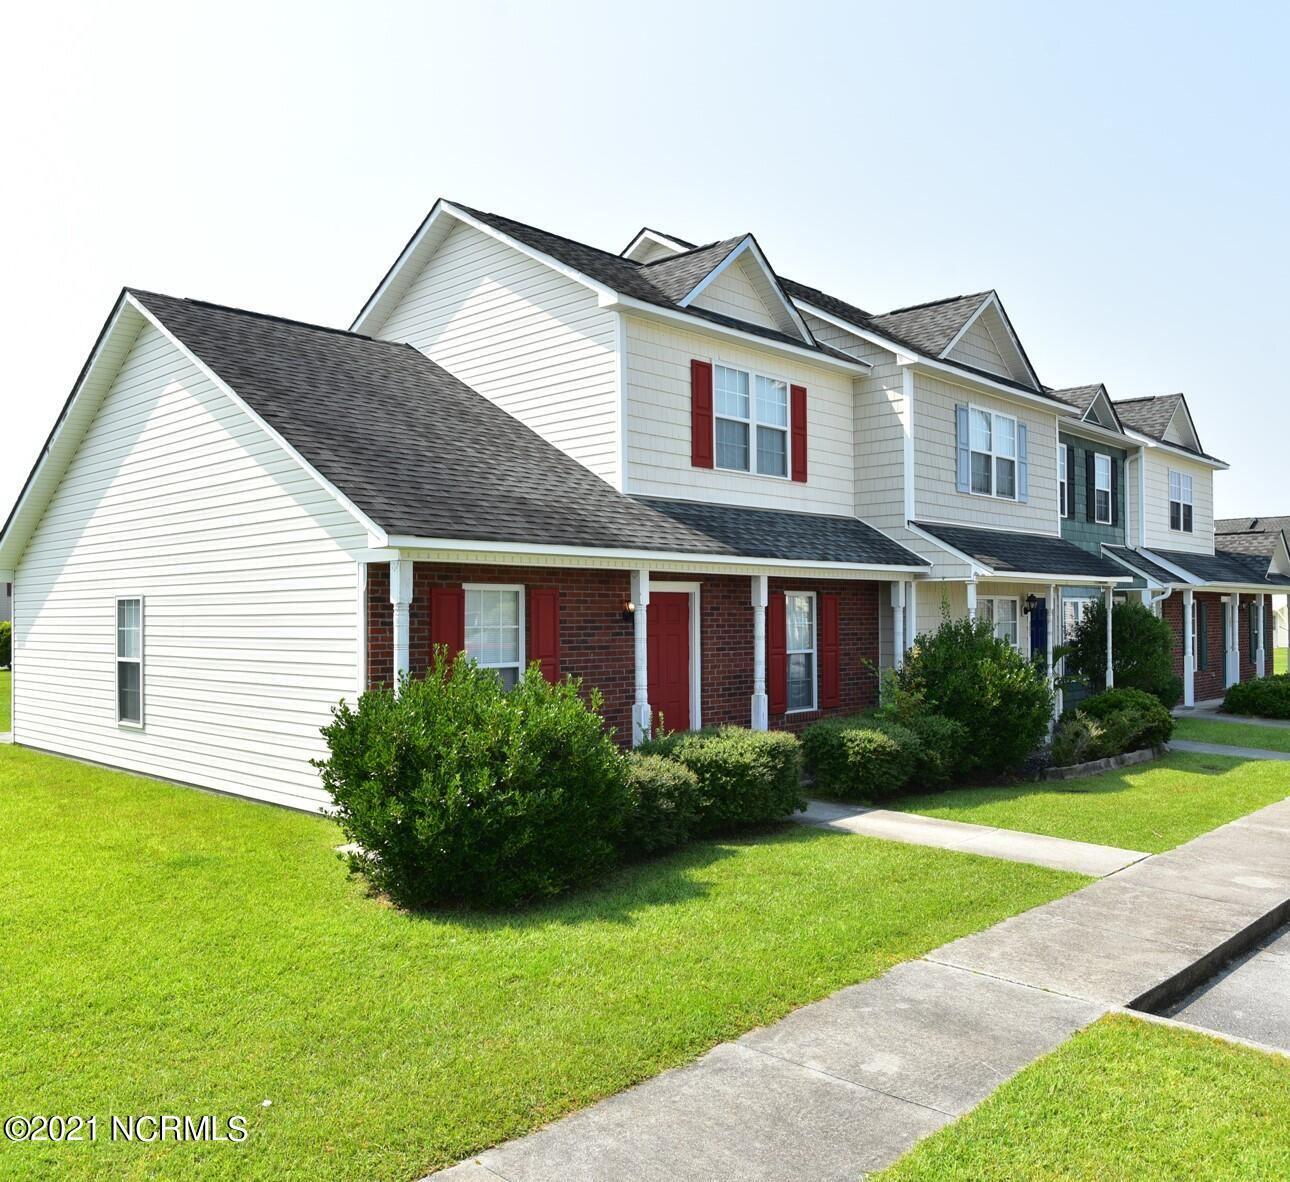 Photo of 201 Ashwood Drive, Jacksonville, NC 28546 (MLS # 100290588)